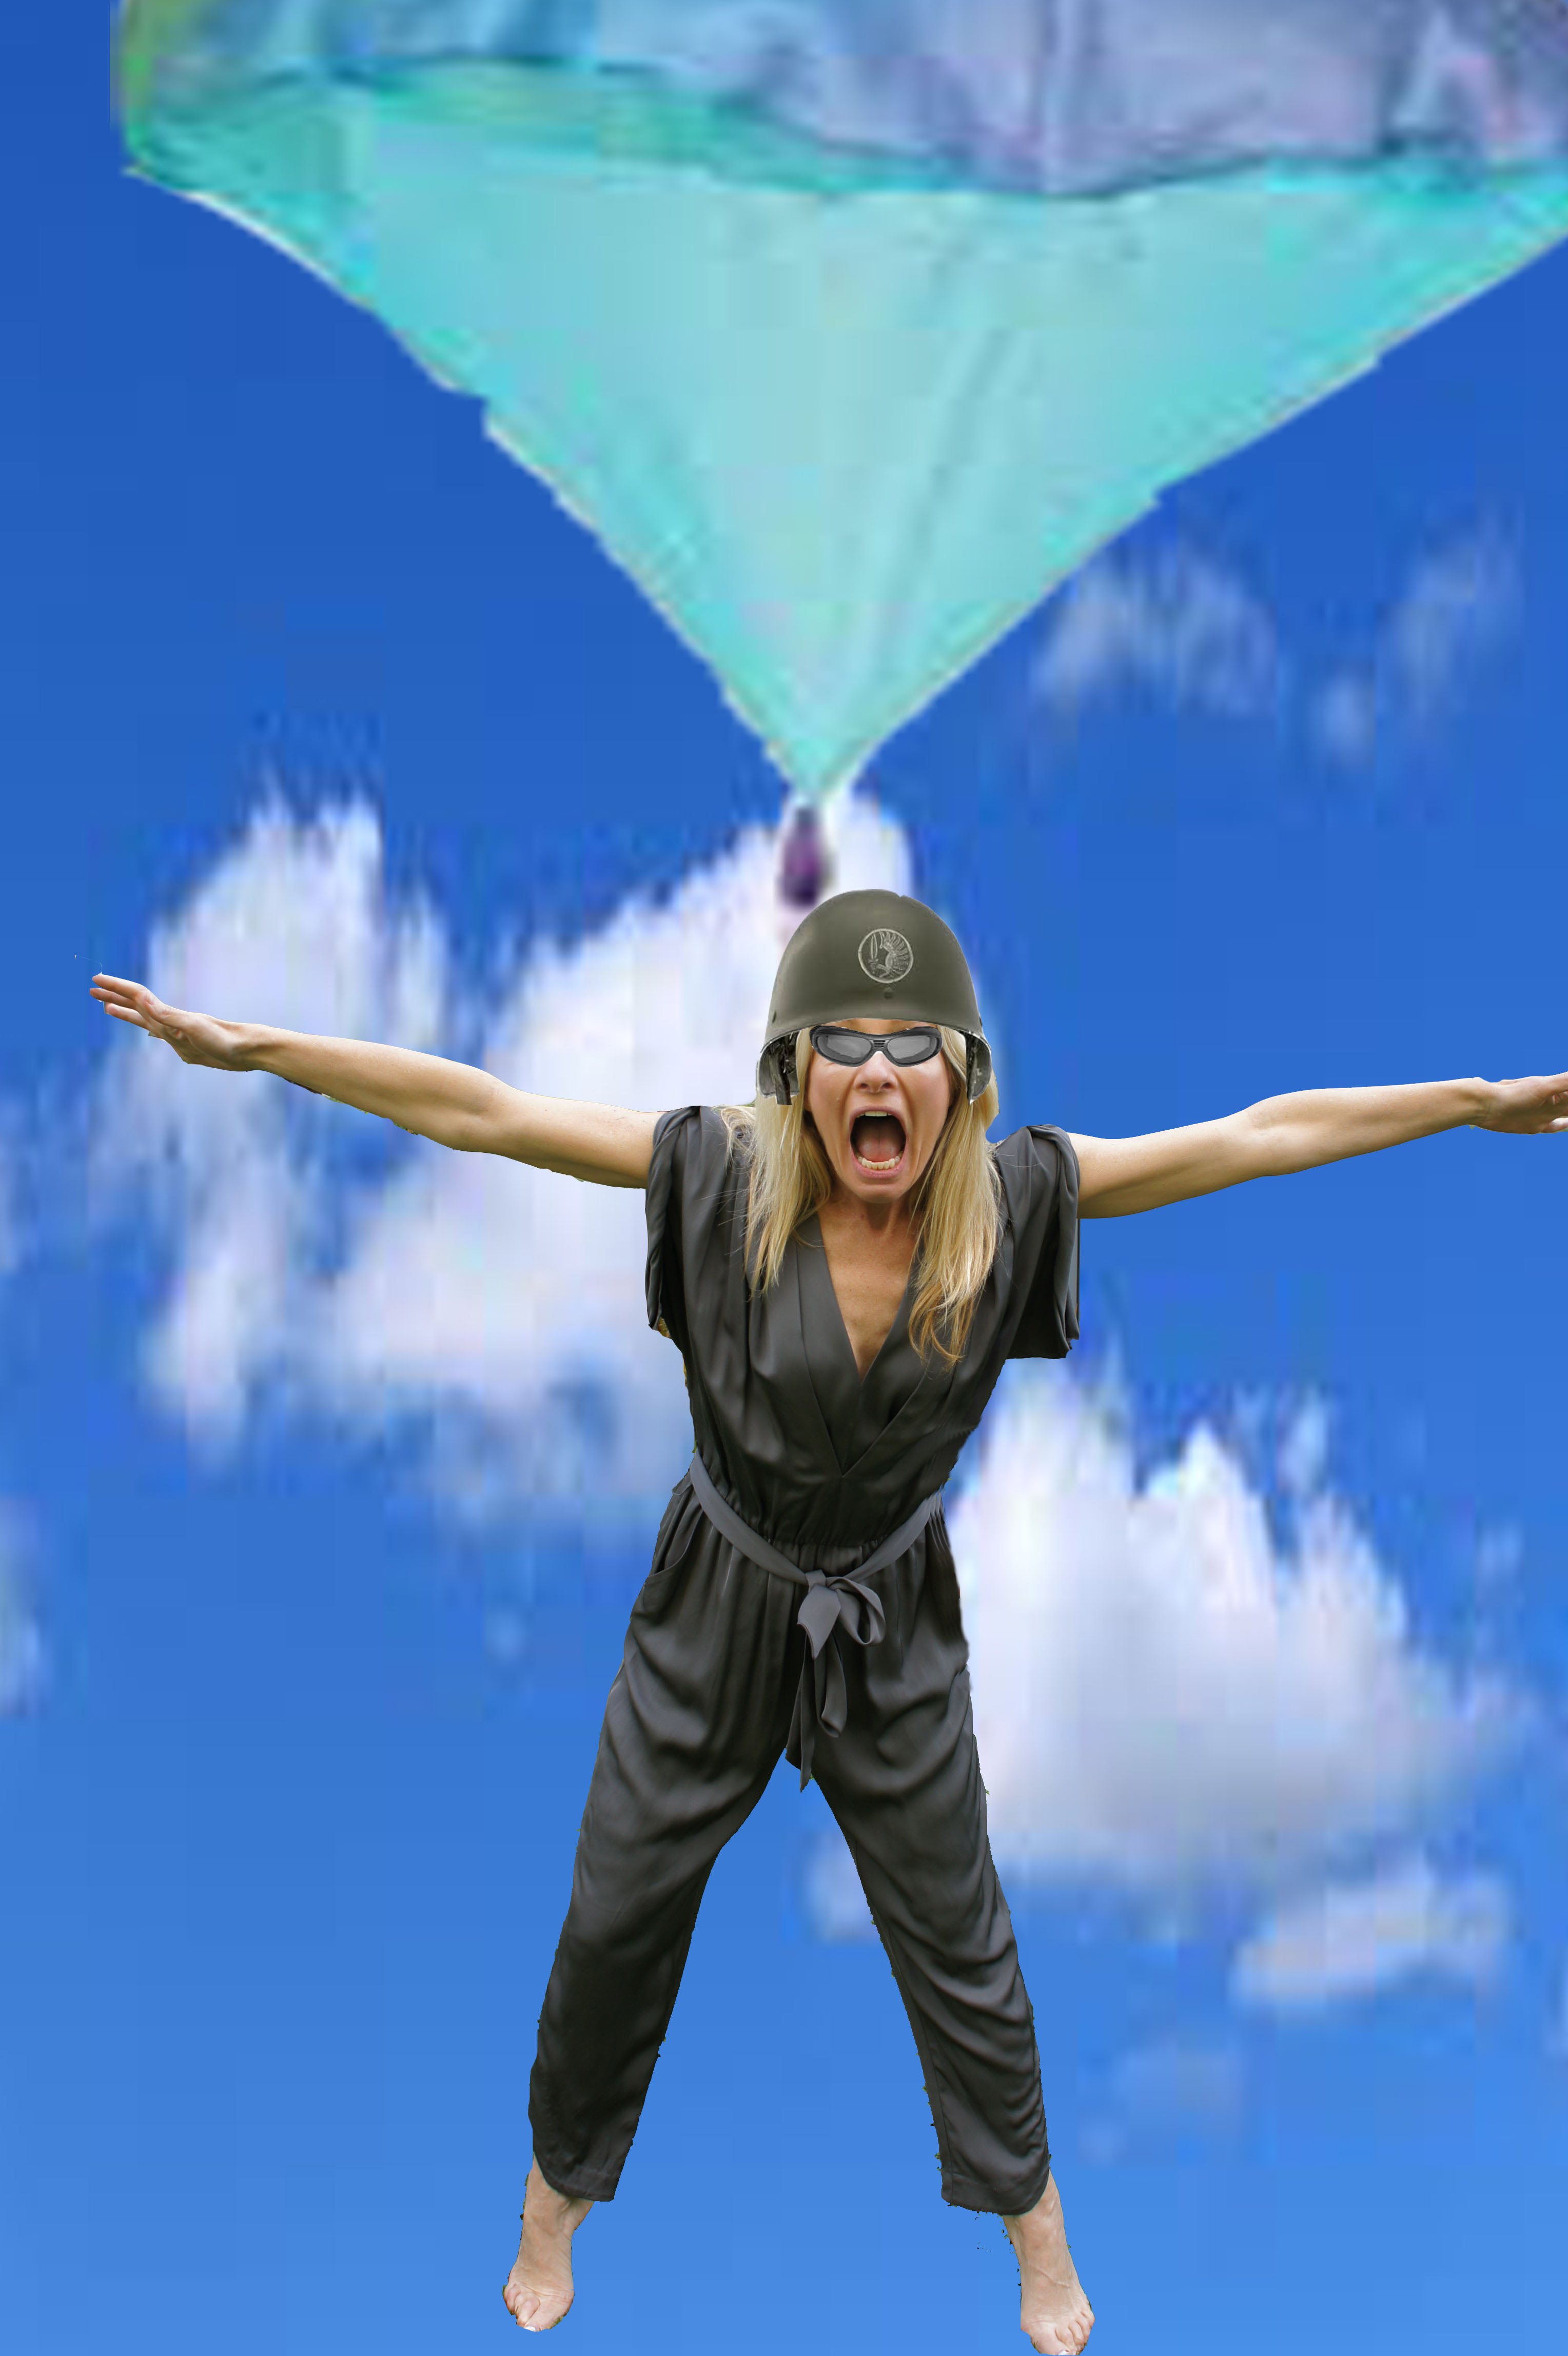 2012-03-12-jodyskidiving.jpg